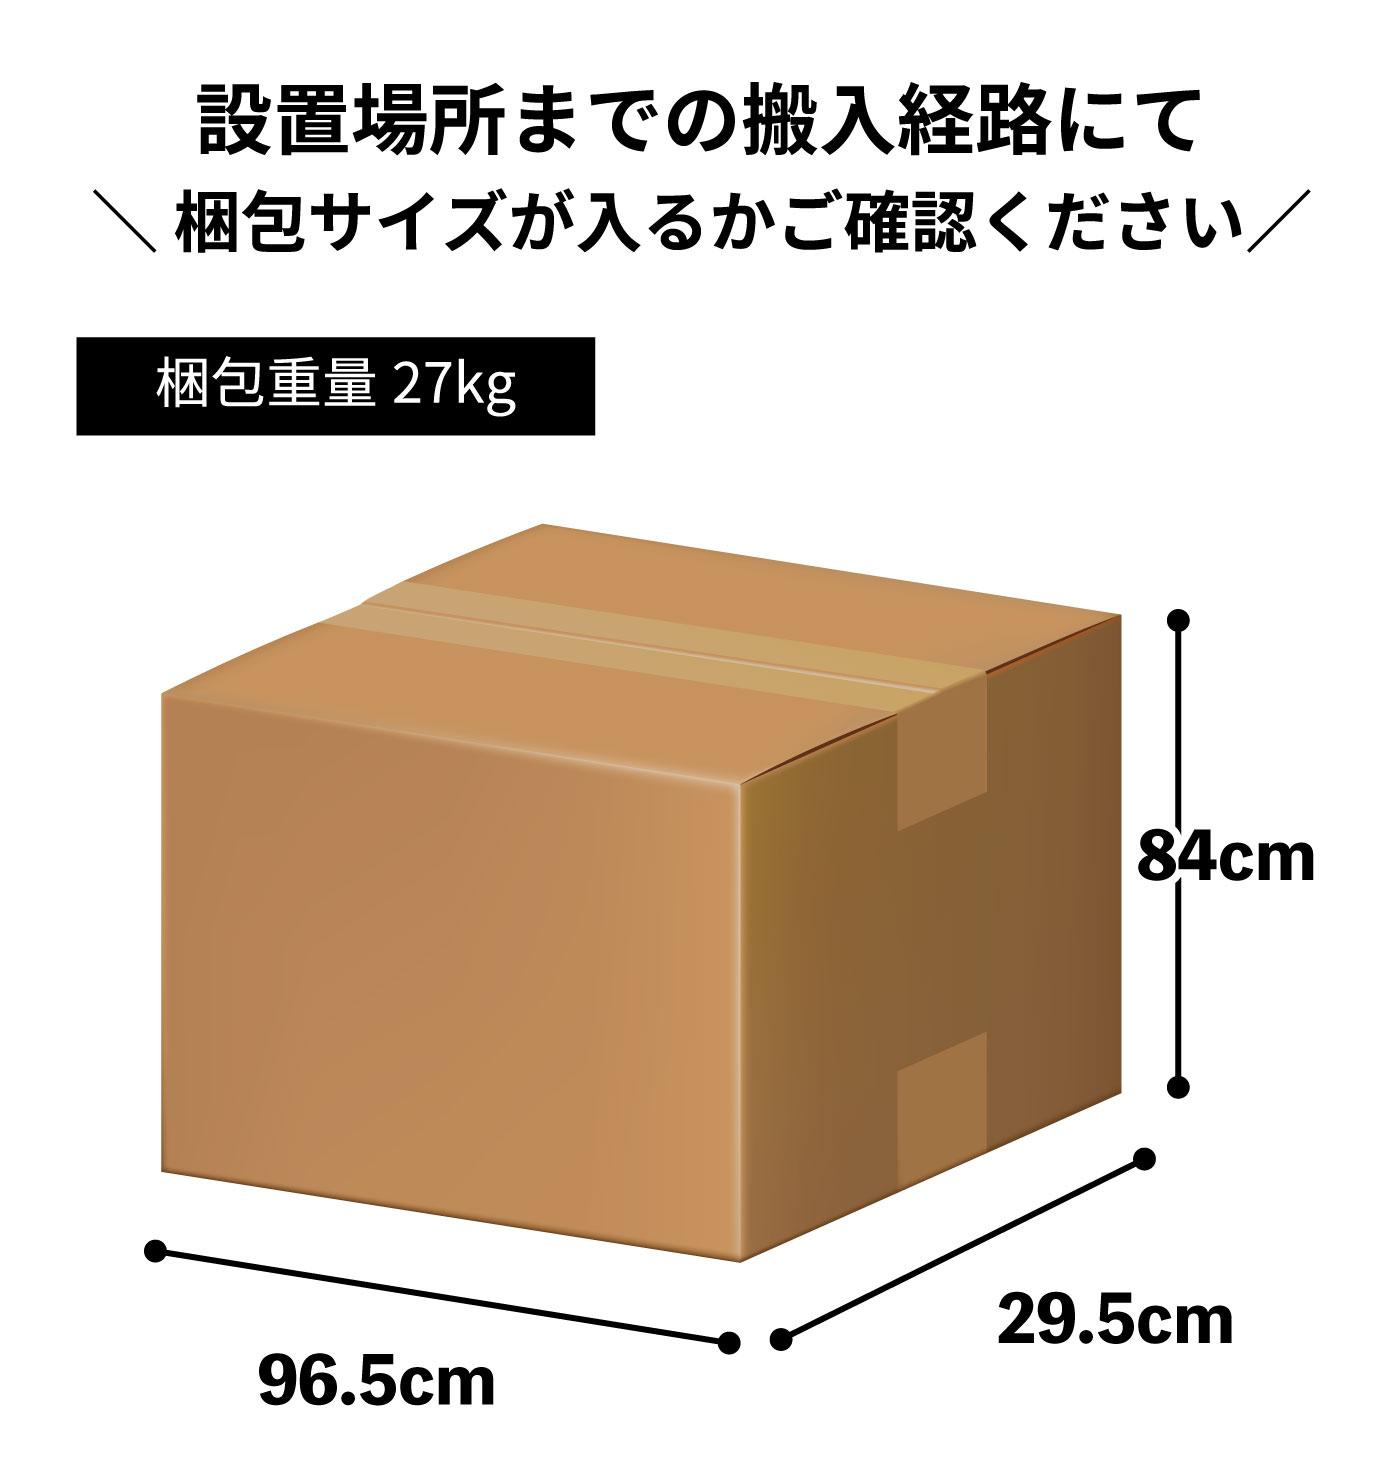 DK-7115の梱包サイズ